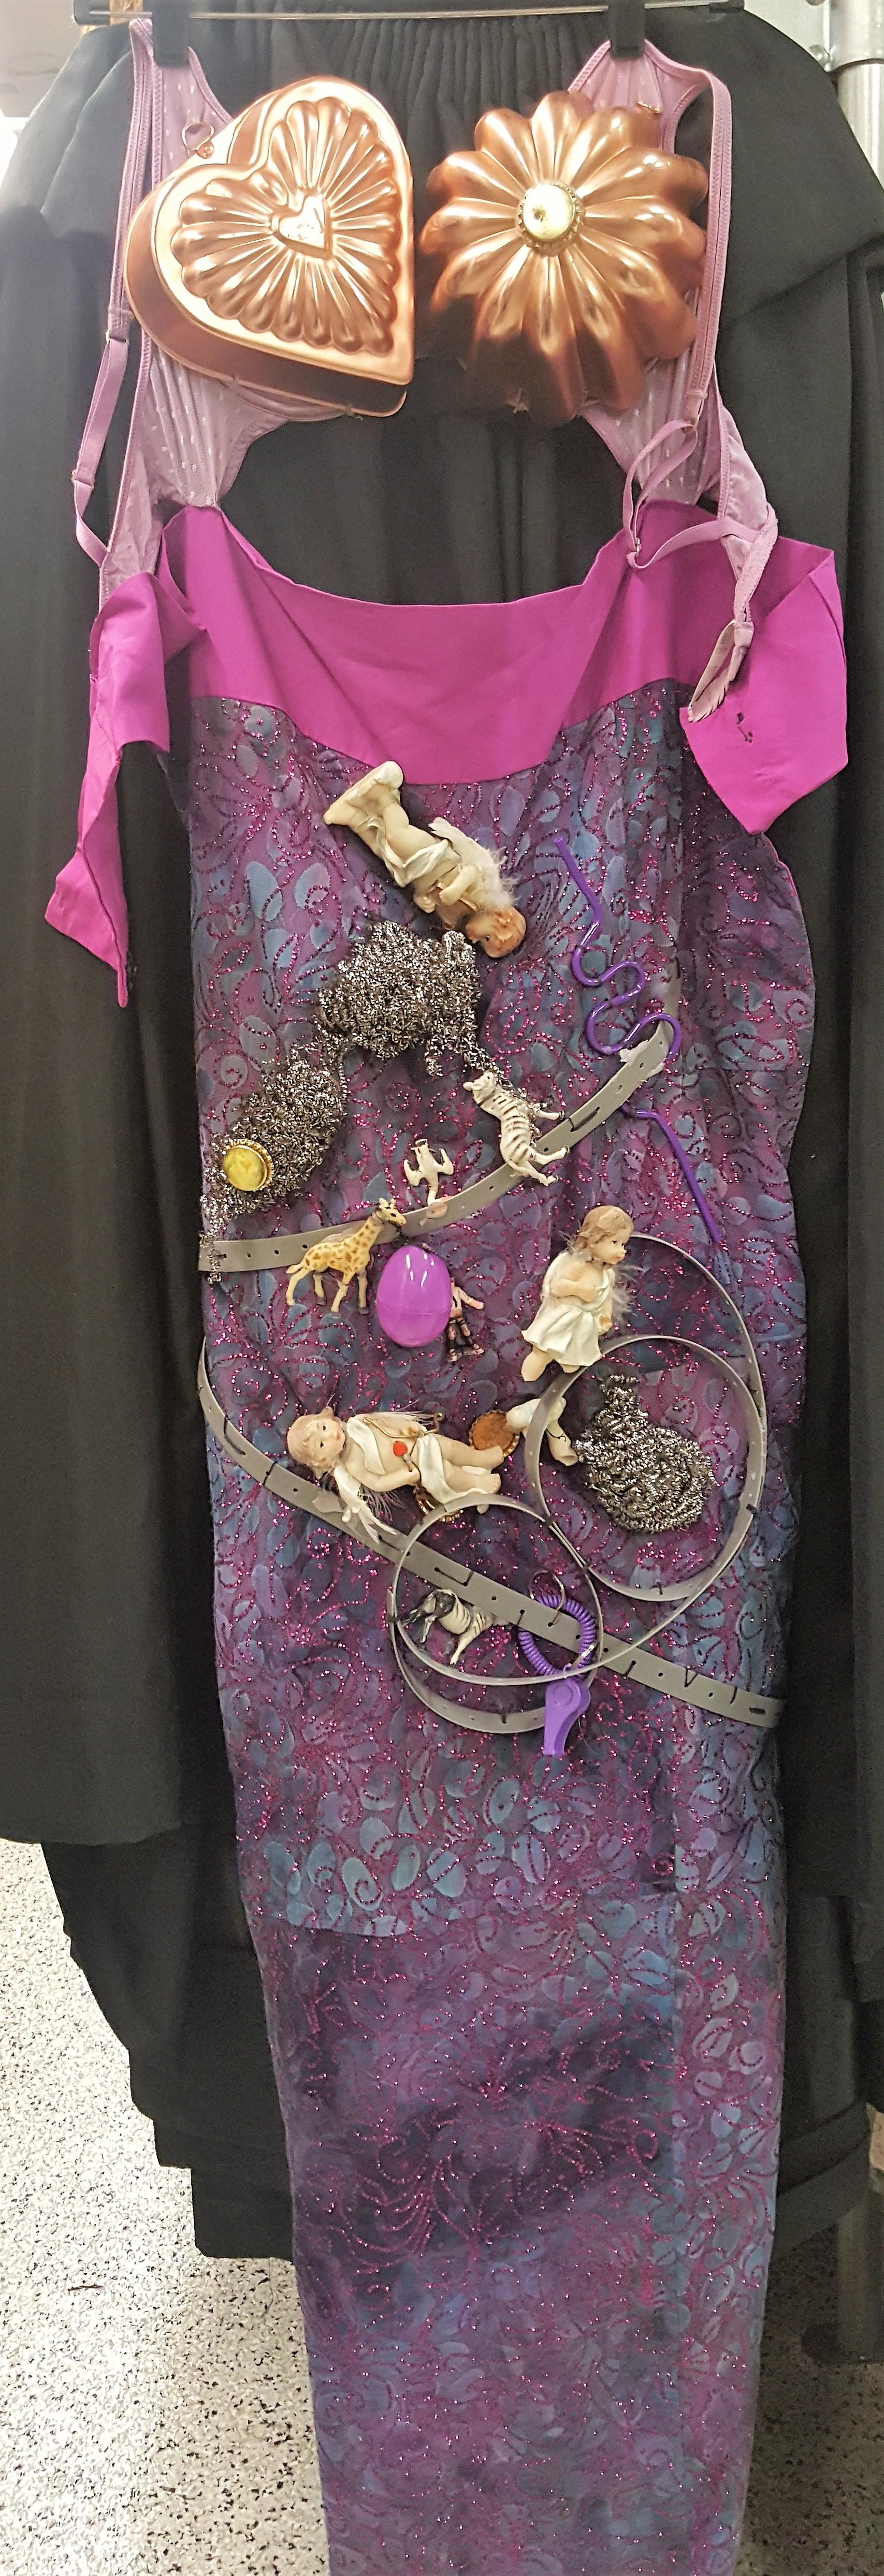 Purple, Fuschia _ Cake Pans Mermaid.jpg